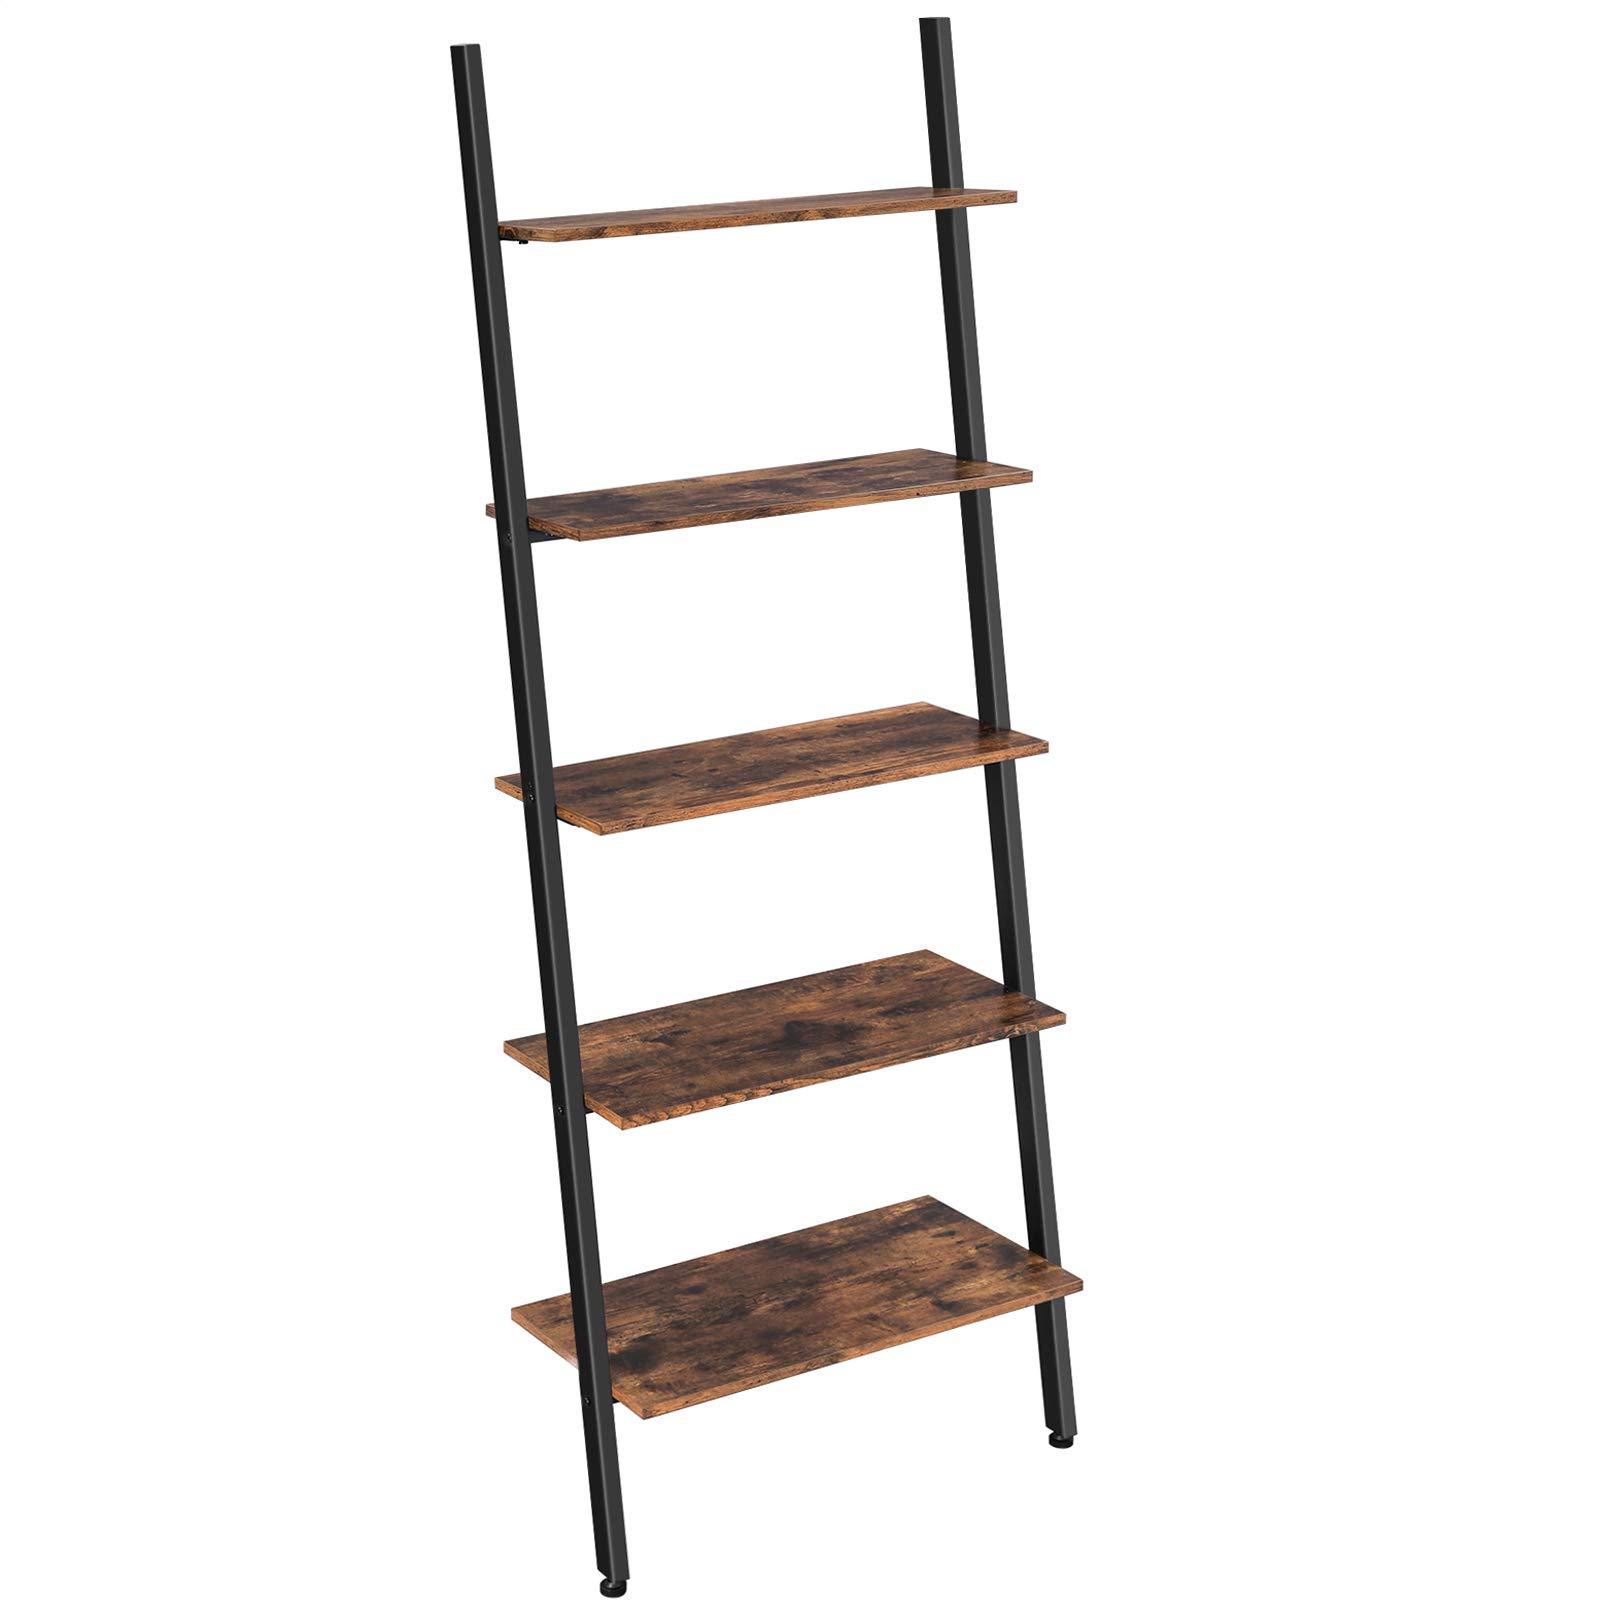 VASAGLE Alinru Ladder Shelf, 5-Tier Bookshelf Rack, Leaning Wall Shelf for Living Room Kitchen Office, Stable Iron, Industrial, Rustic Brown ULLS46BX by VASAGLE